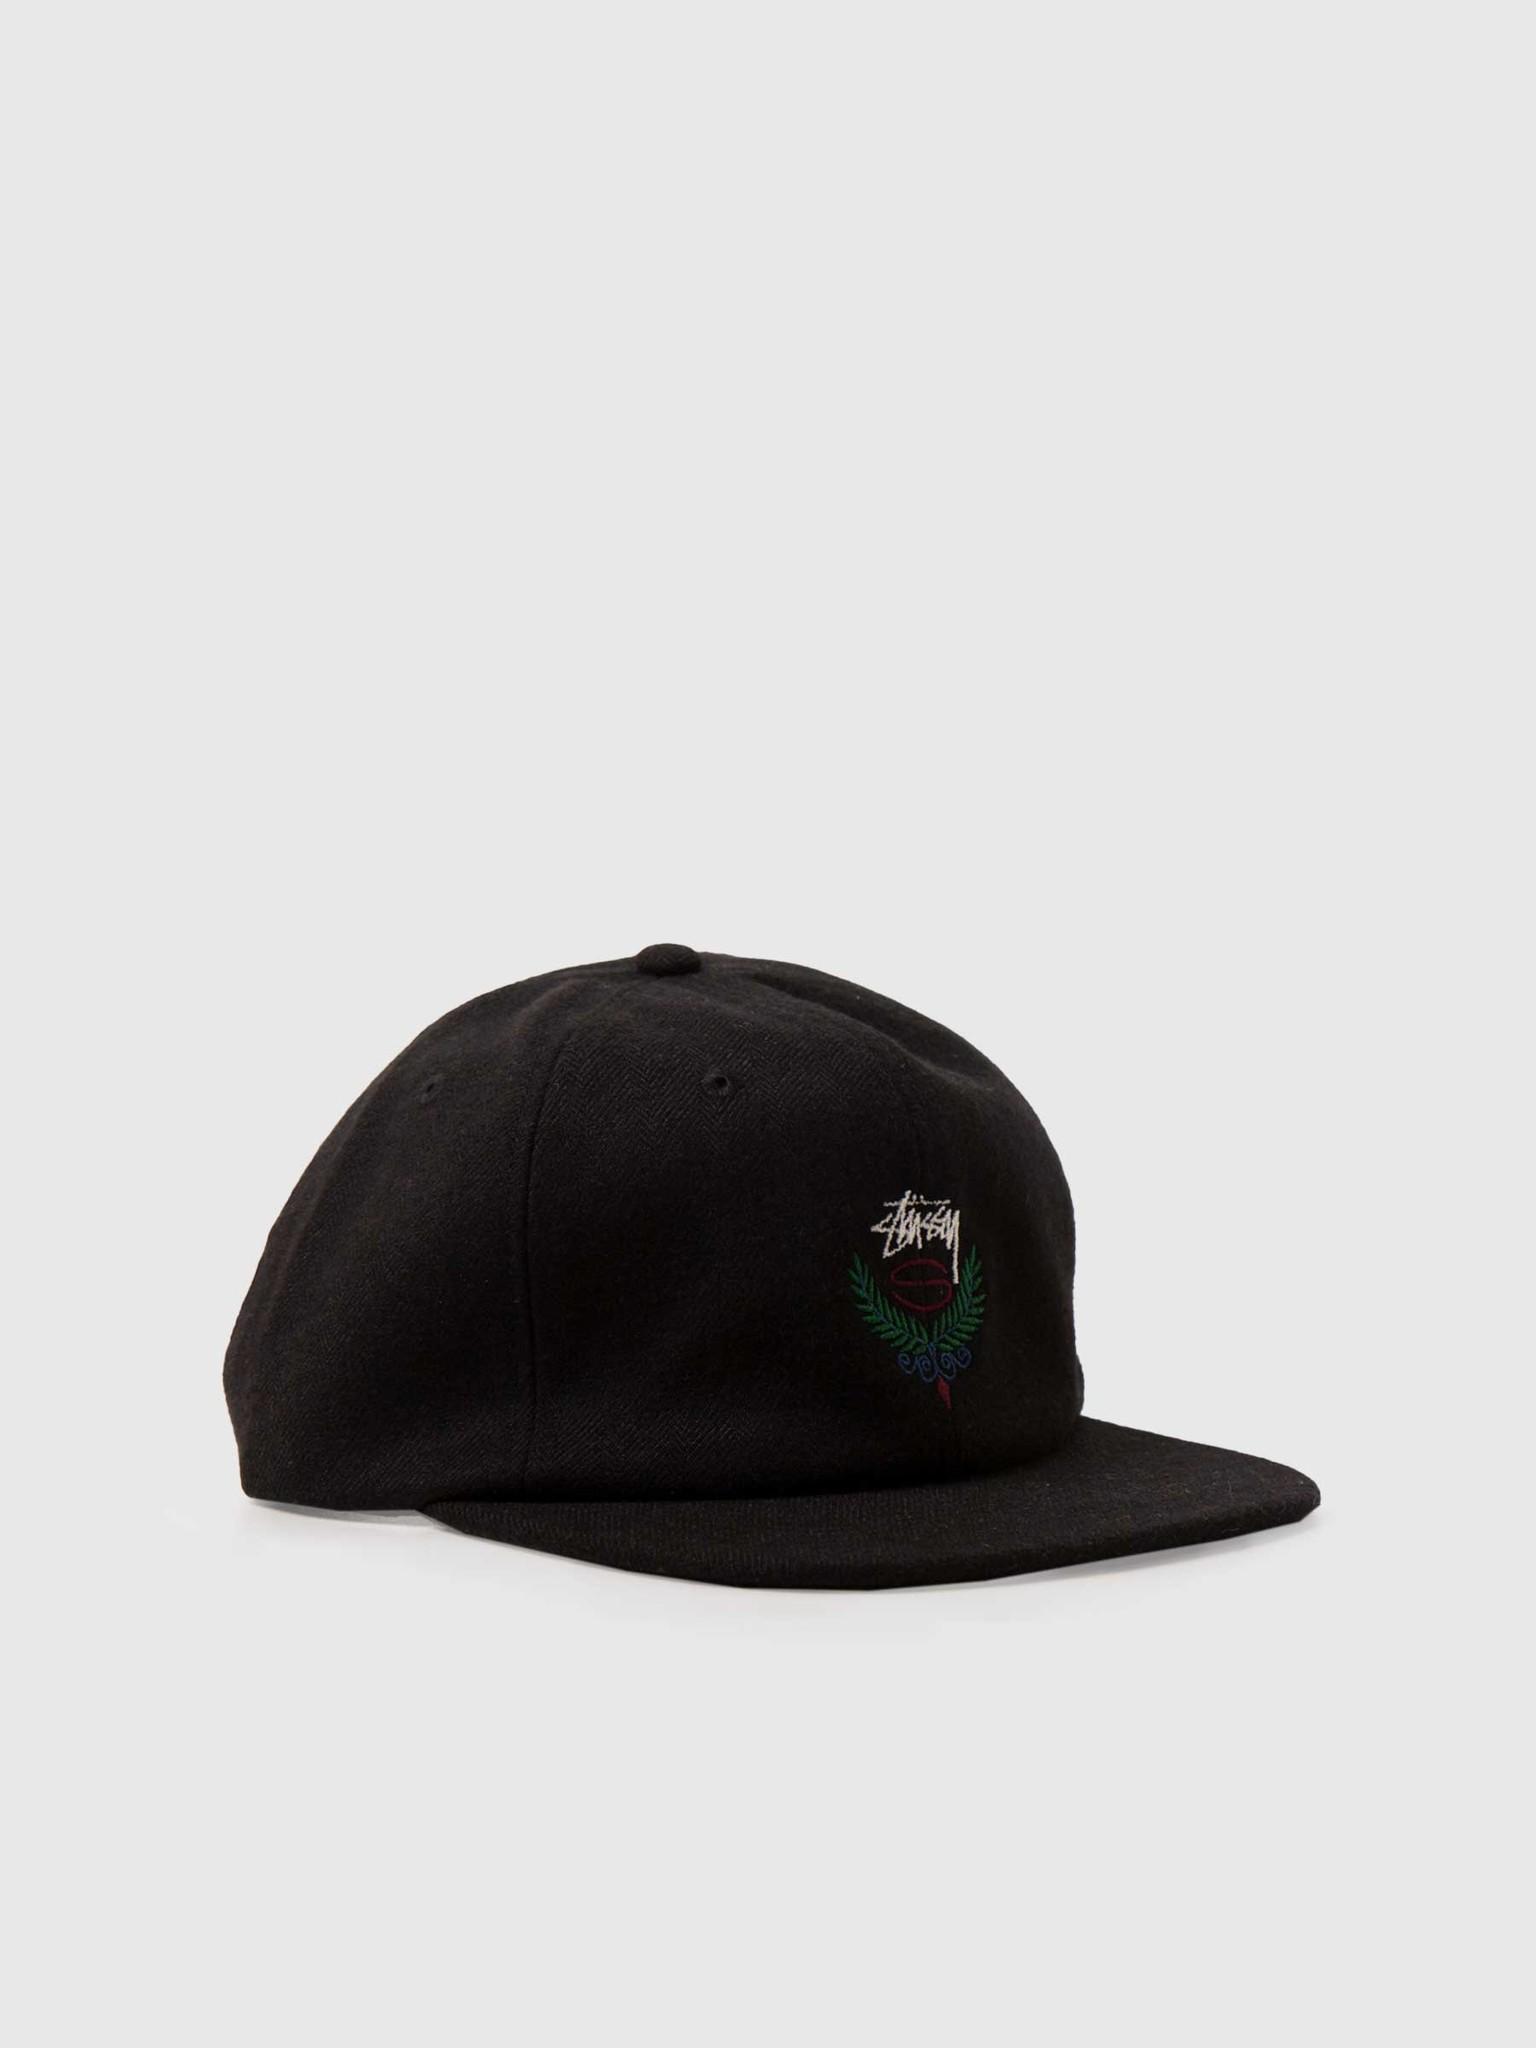 Stussy Stussy Big Herringbone Strapback Cap Black 131963-0001